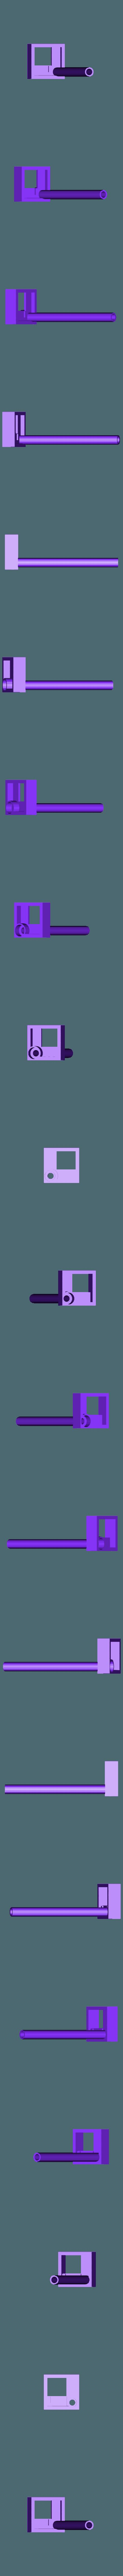 16mm_palier_intermediaire_avec tube IRO.STL Download STL file SNCF lighting pylon • 3D printable object, dede34500